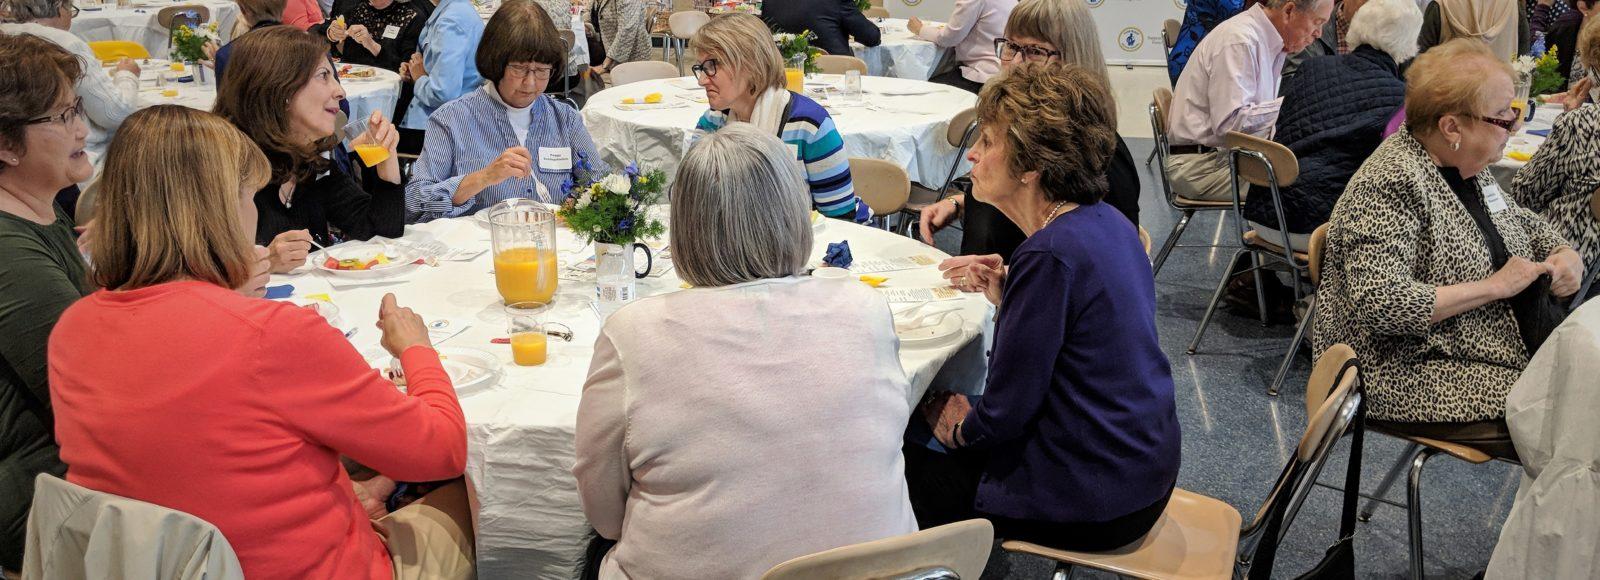 Familiar faces gather for Penn Manor Retiree Breakfast